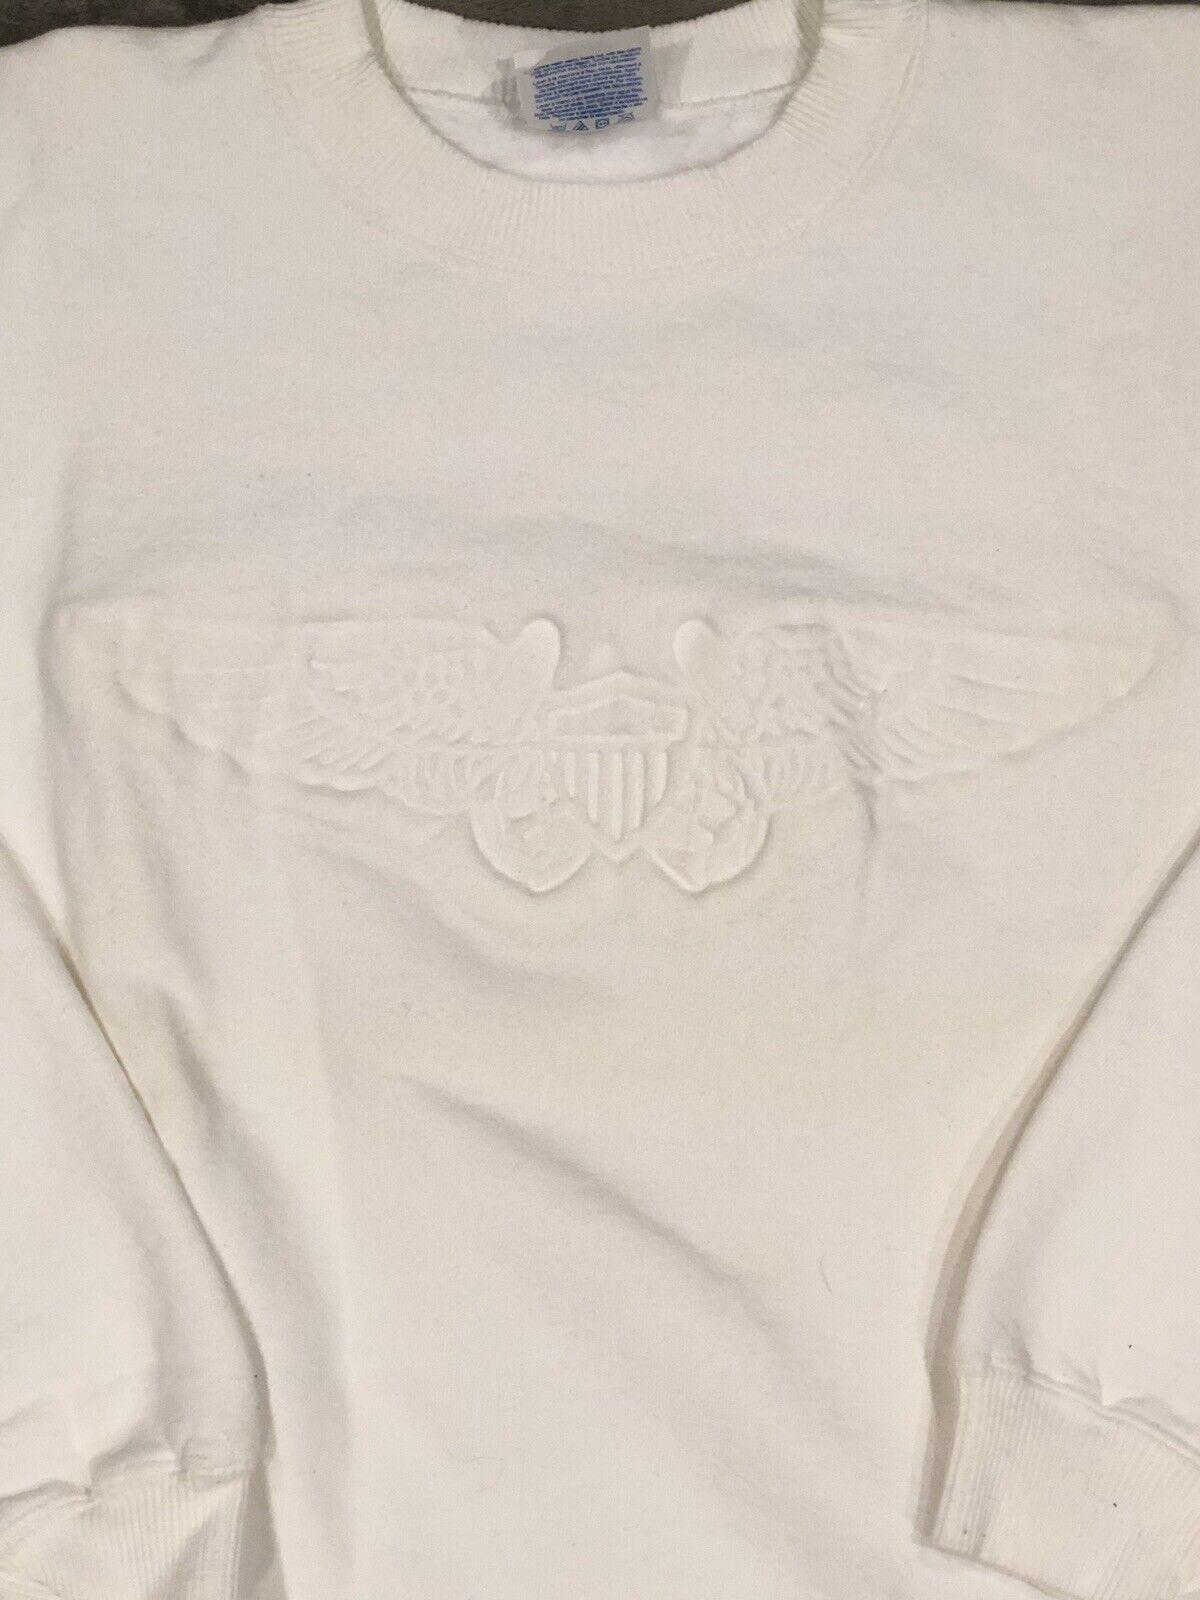 US ARMY Aviator Wings Pilot Embossed SWEATER Gildan Large Sweatshirt West Point